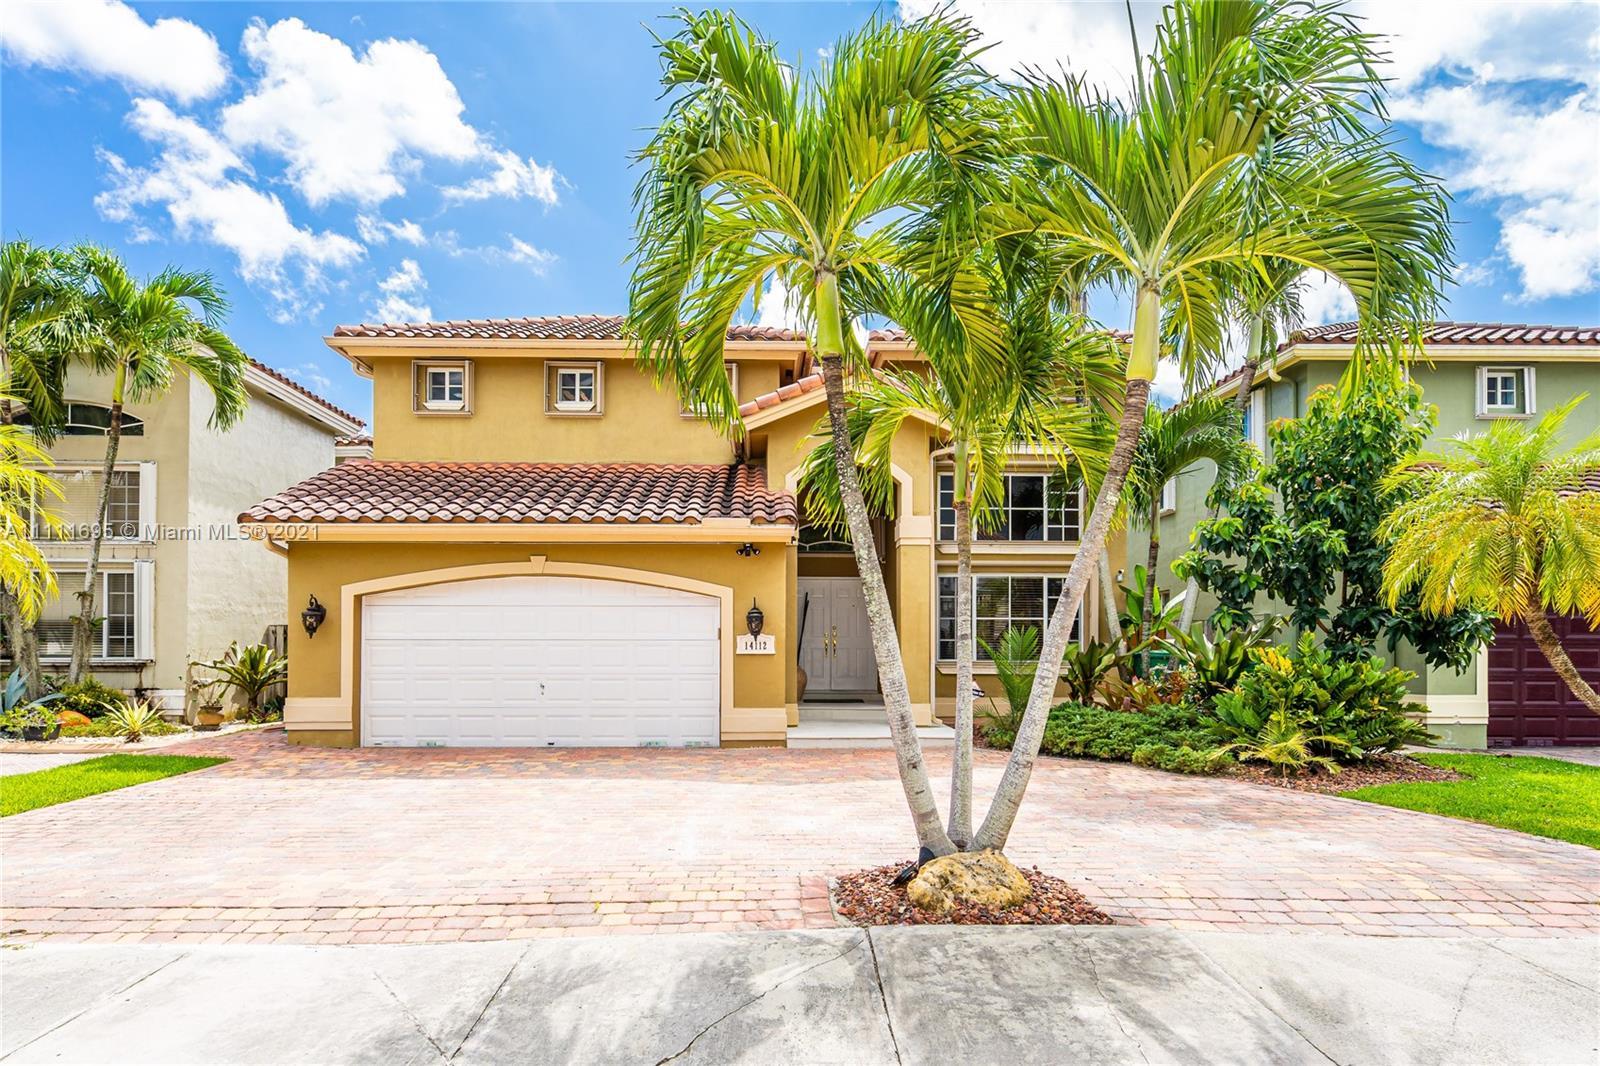 Single Family Home,For Sale,14112 SW 153rd Ter, Miami, Florida 33177,Brickell,realty,broker,condos near me